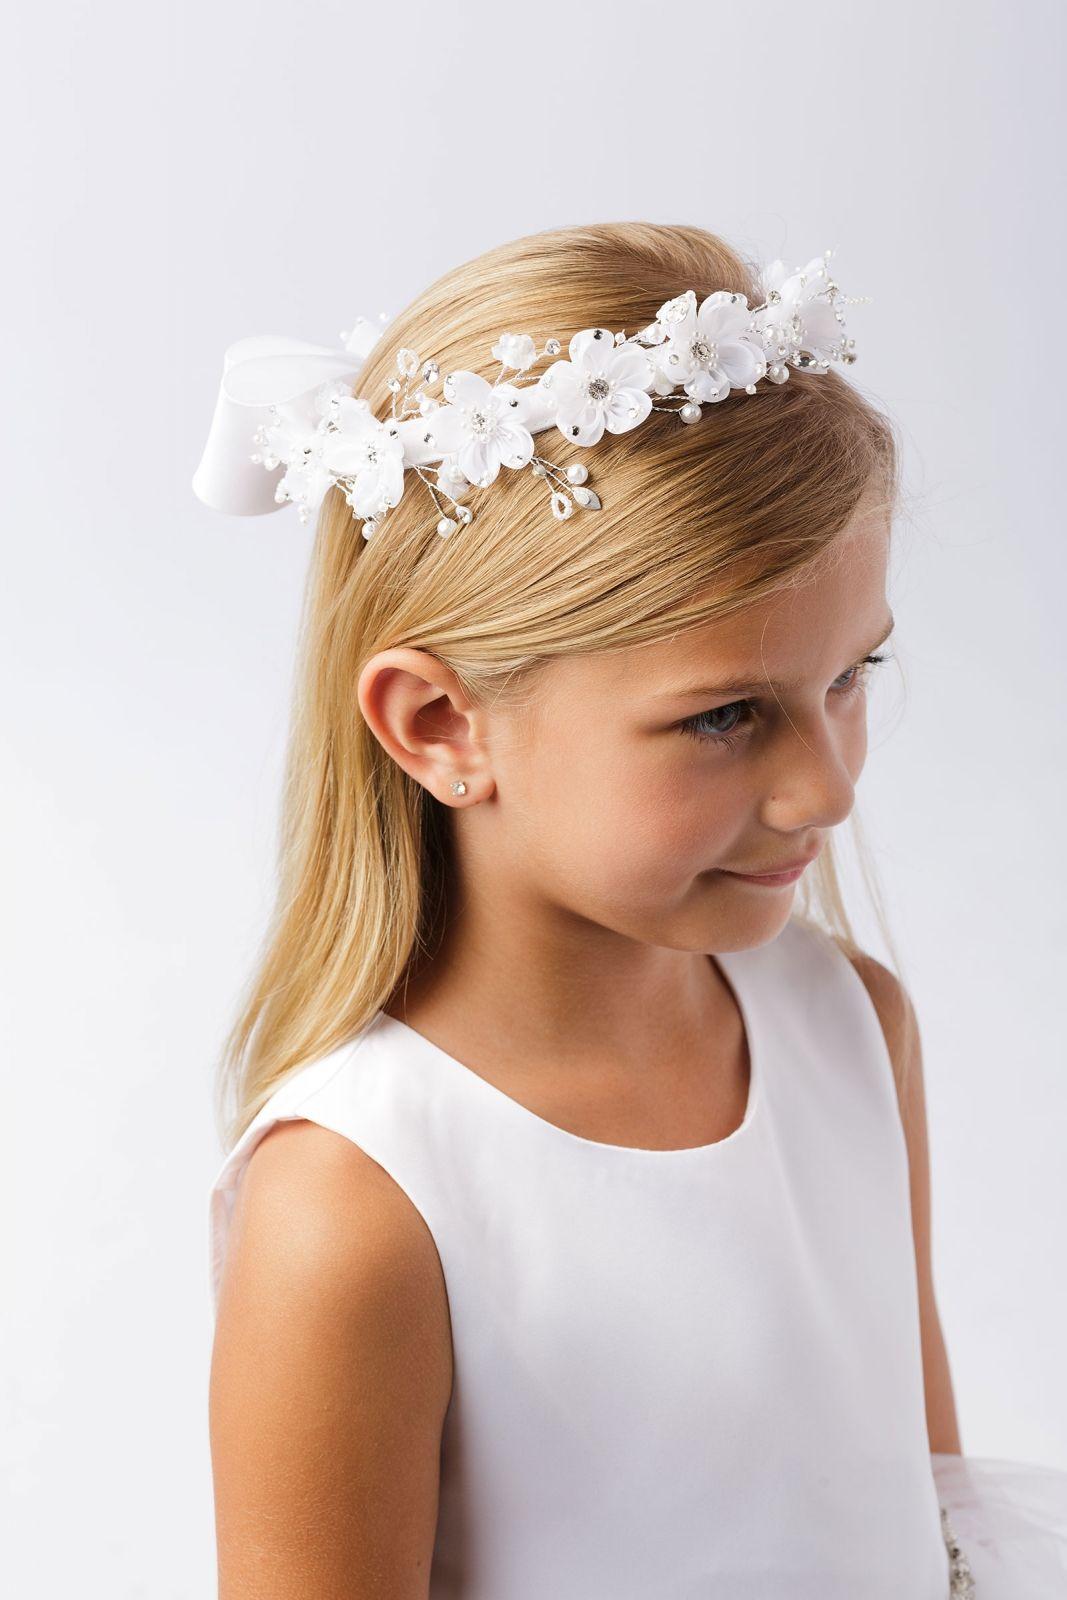 Tt538 Head Wreath Bridal Quality Crown Style 538 In Choice Of